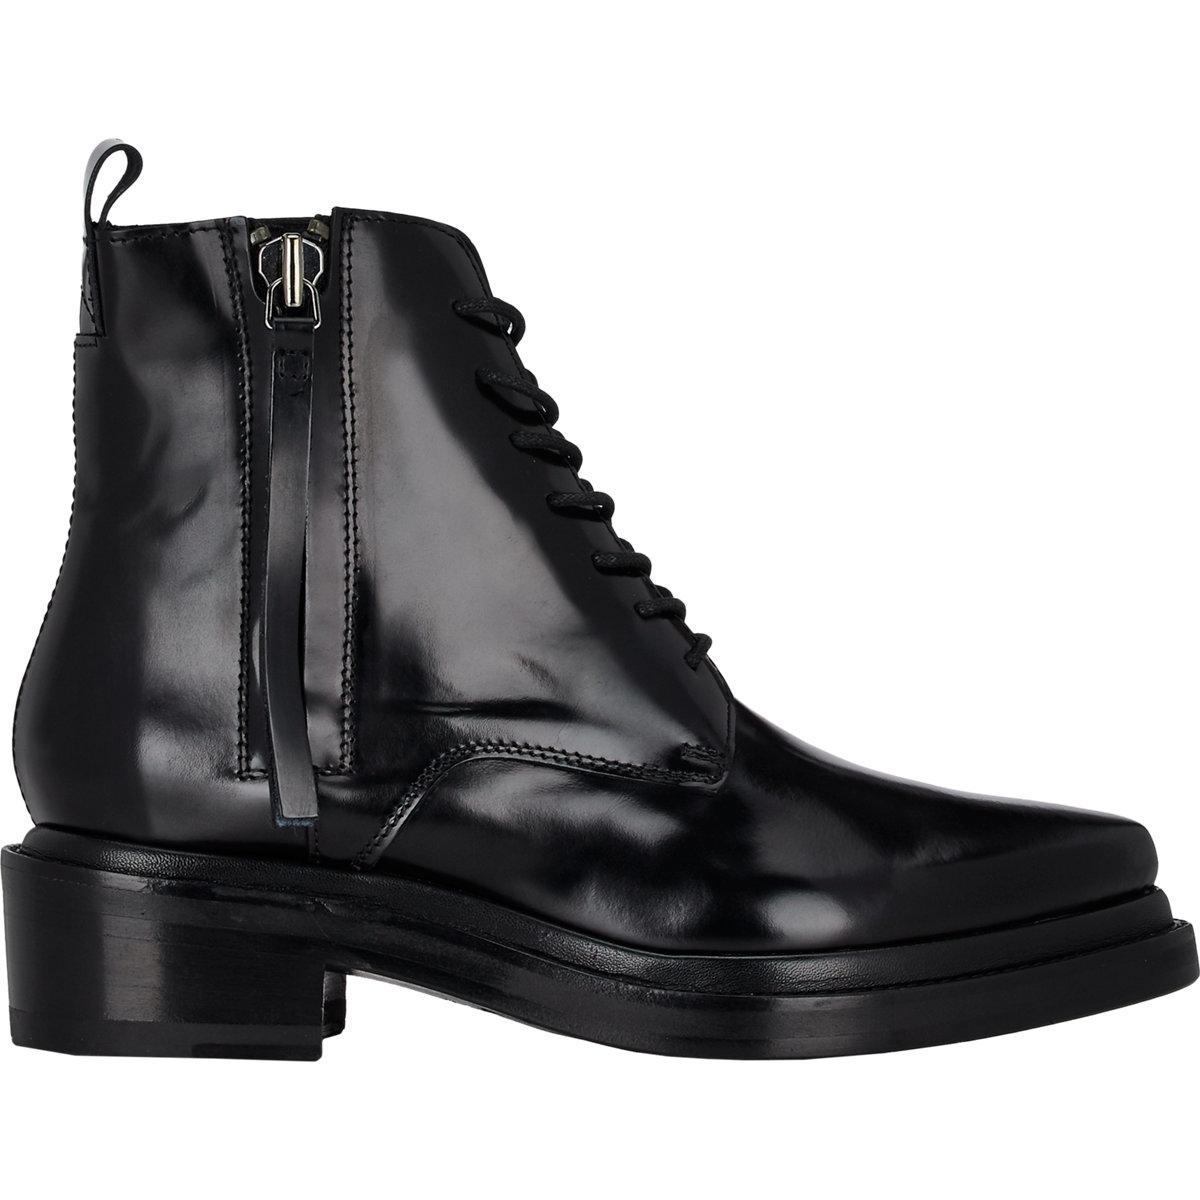 10c4f92806b3 Lyst - Acne Studios Women s Spazzolato Linden Boots in Black